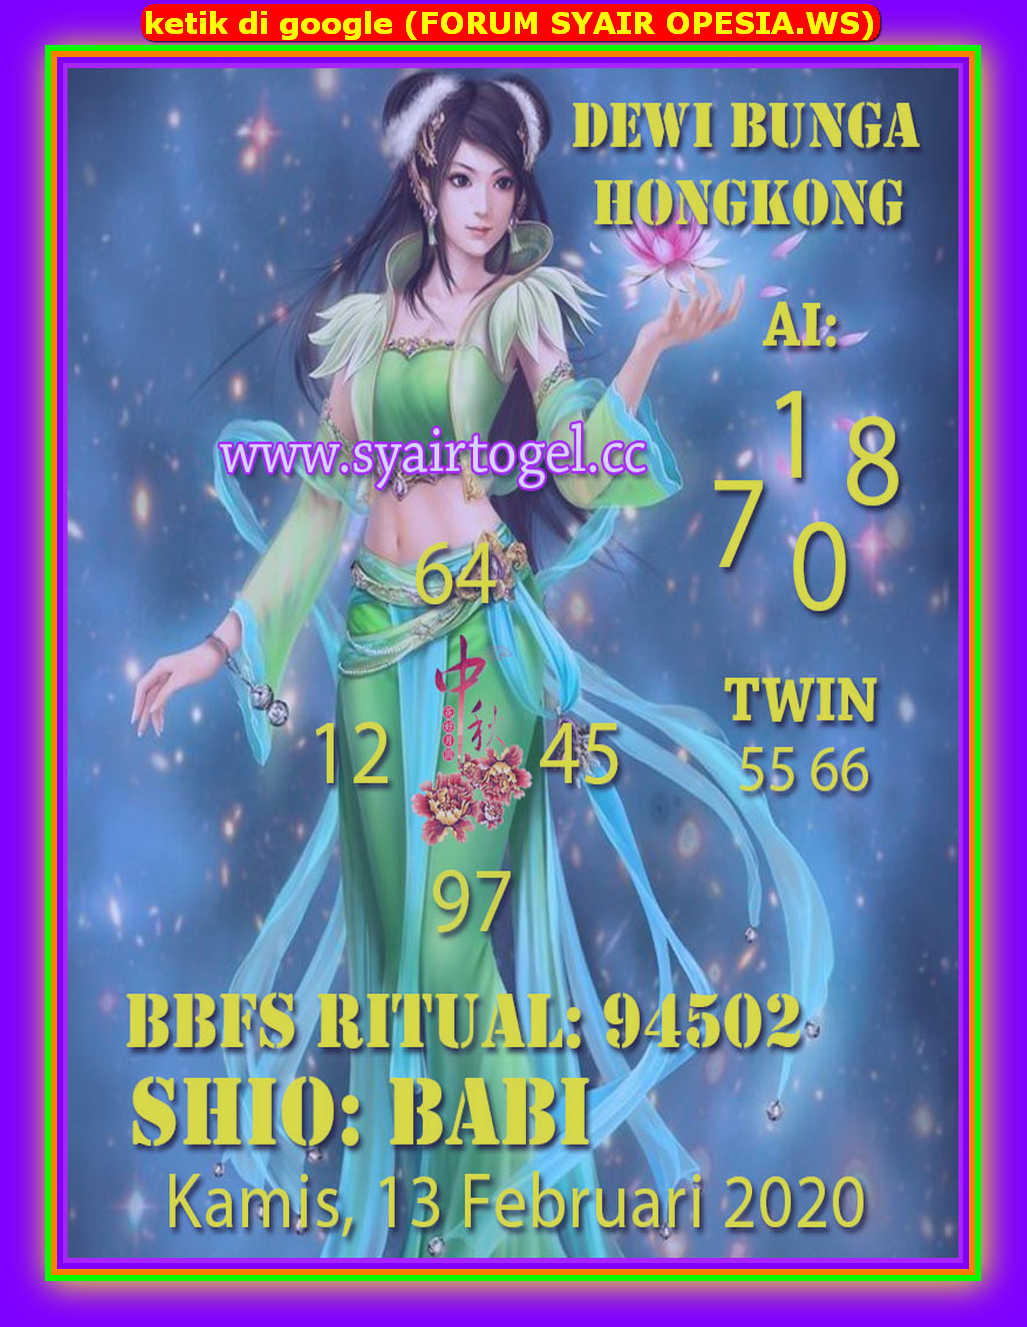 Kode syair Hongkong Kamis 13 Februari 2020 149